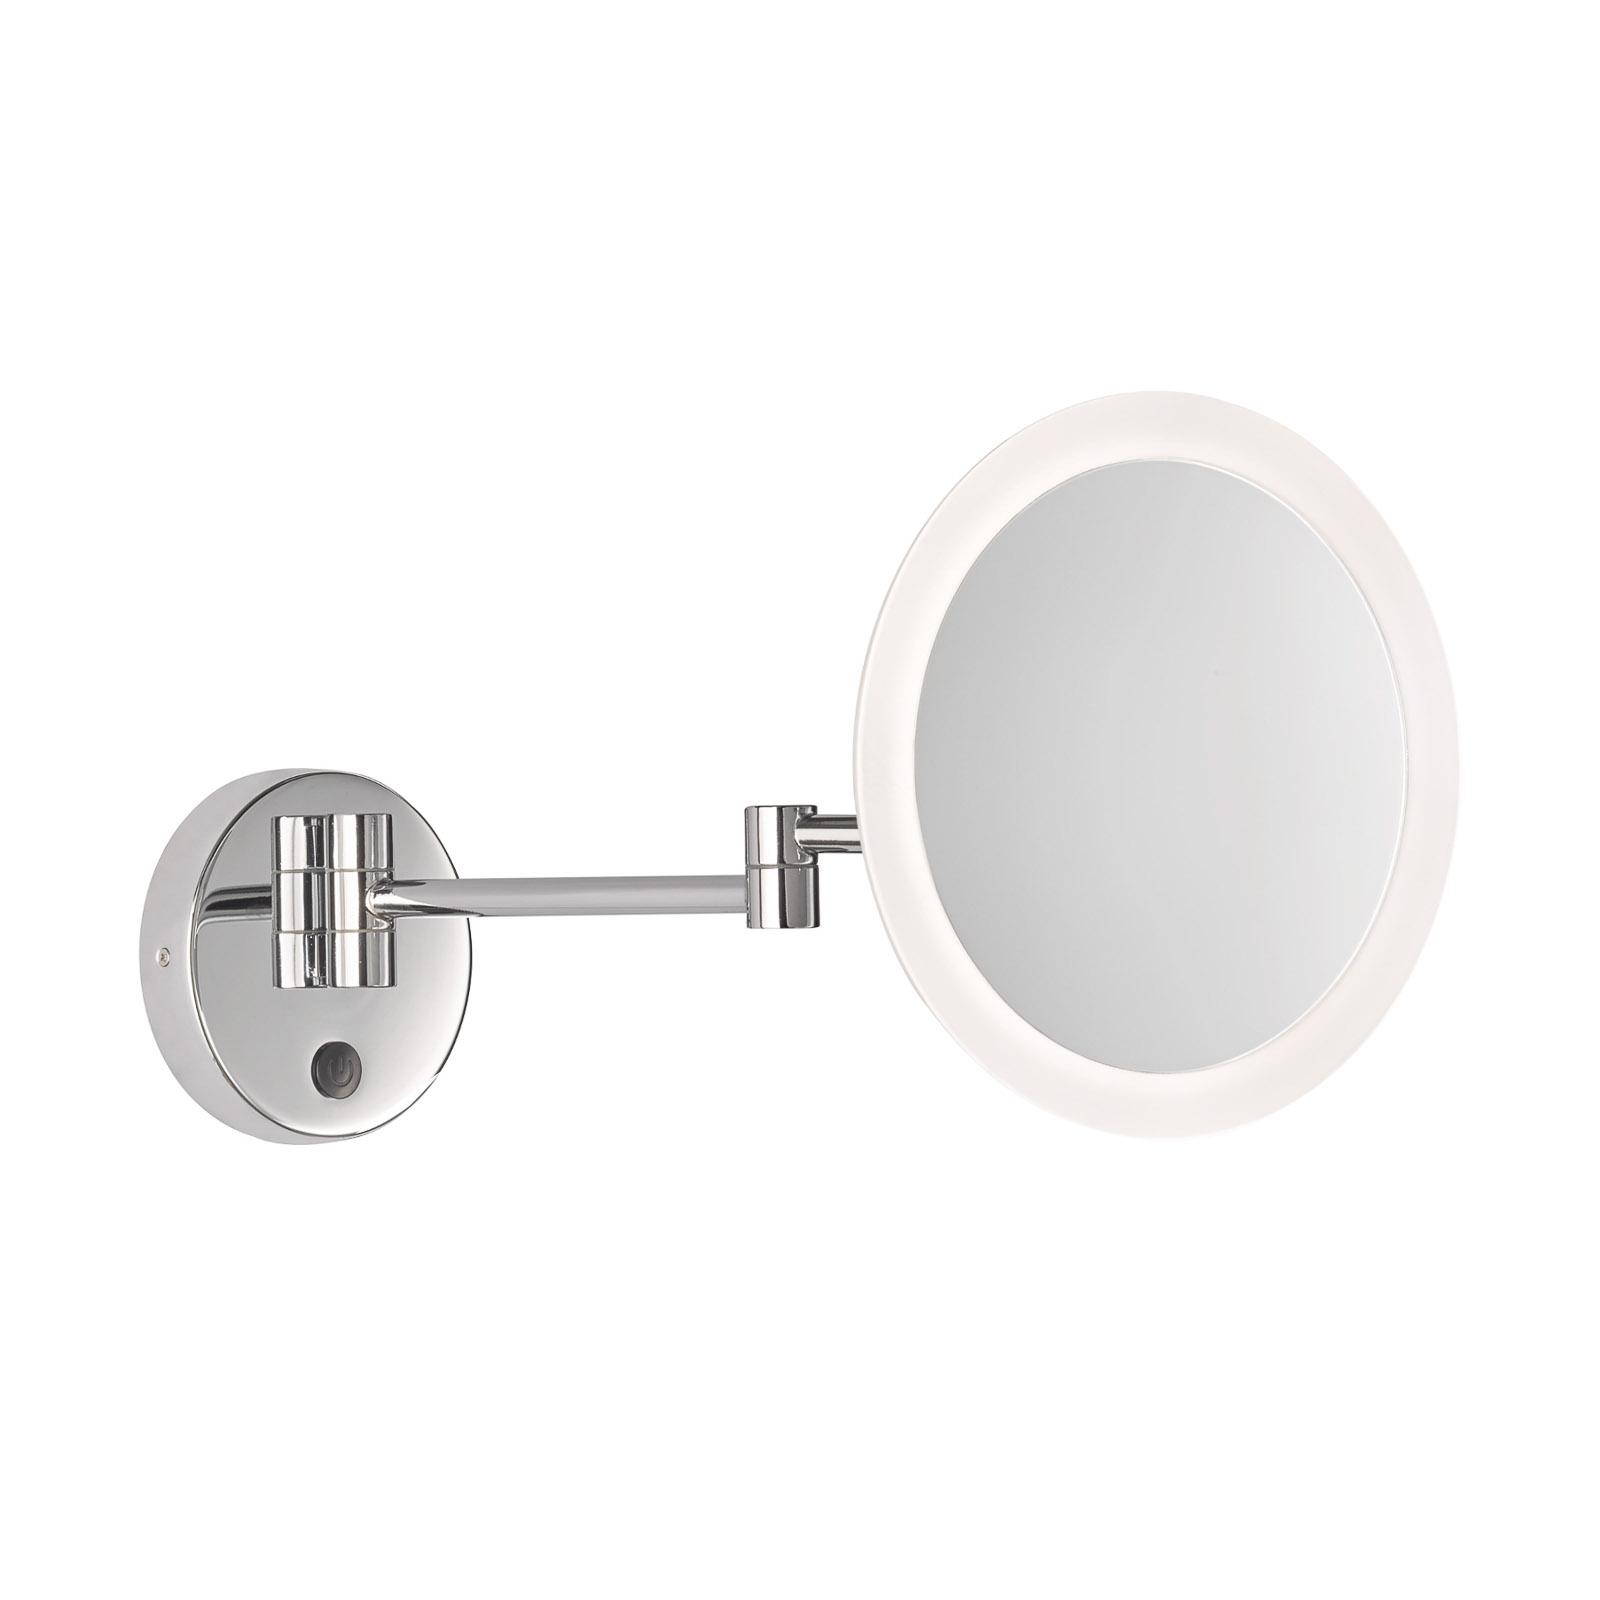 Kosmetikspiegel Tom mit LED-Beleuchtung